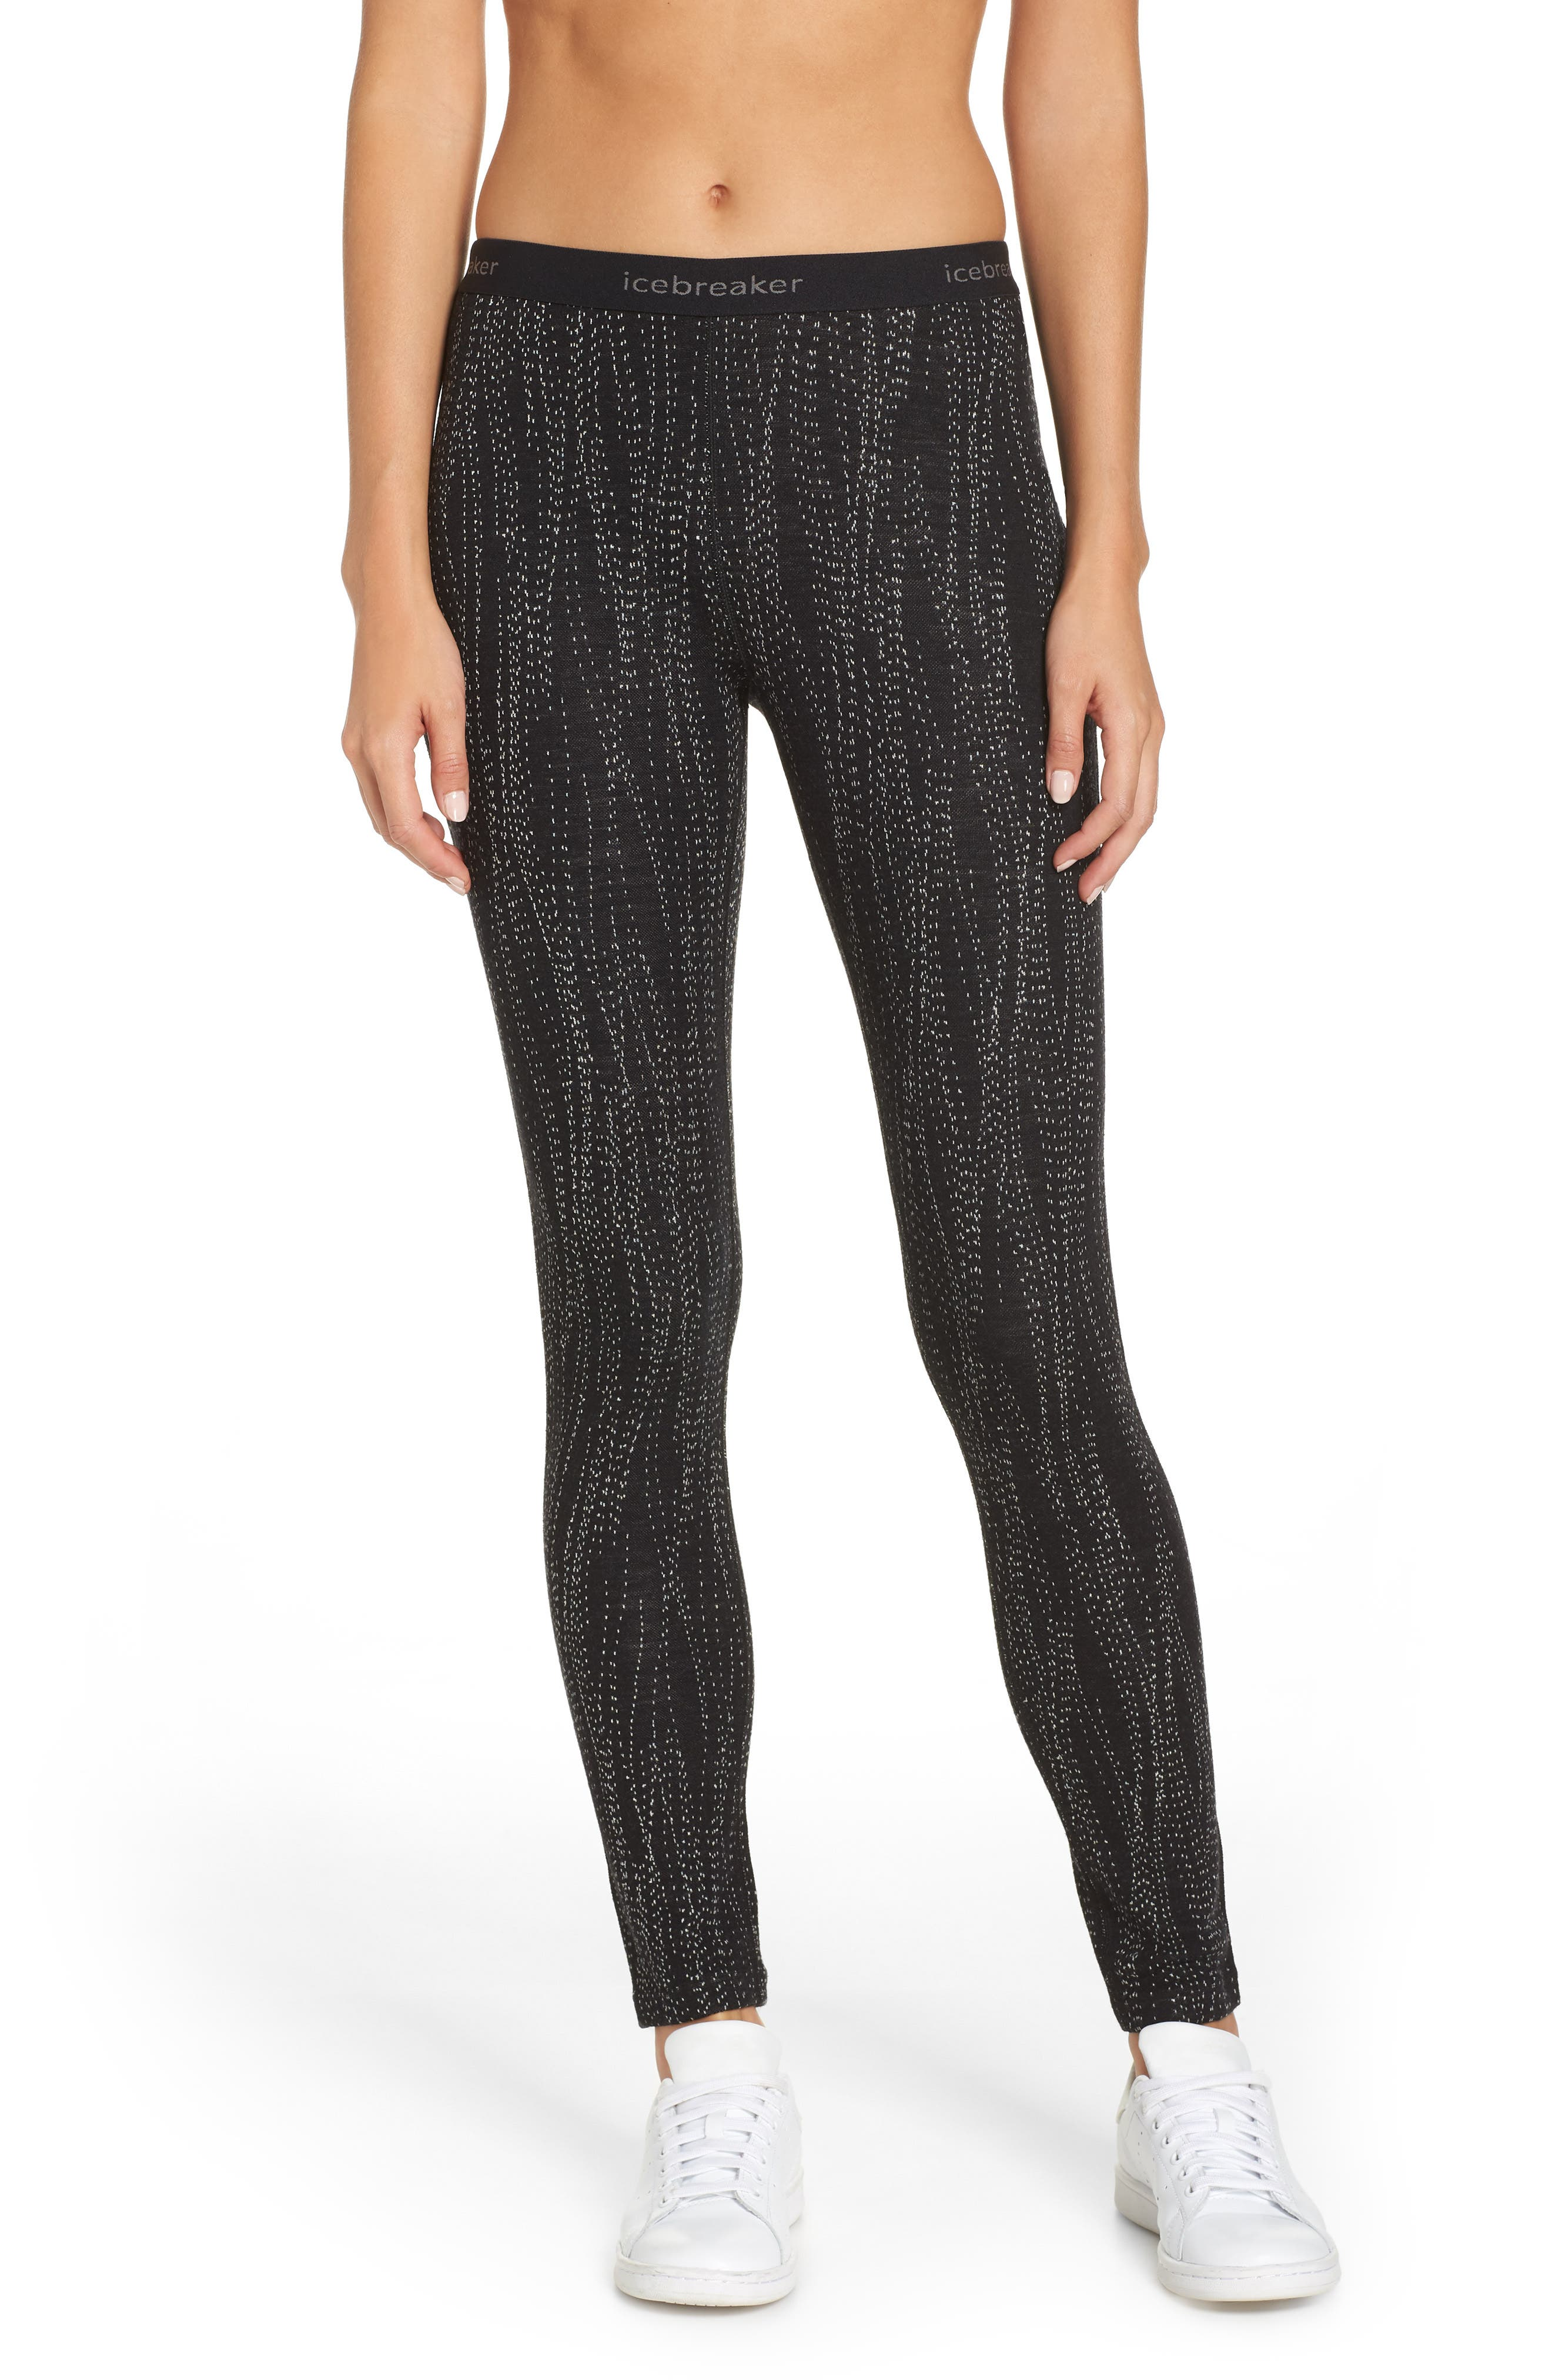 250 Vertex Merino Wool Base Layer Leggings,                             Main thumbnail 1, color,                             BLACK/ SNOW